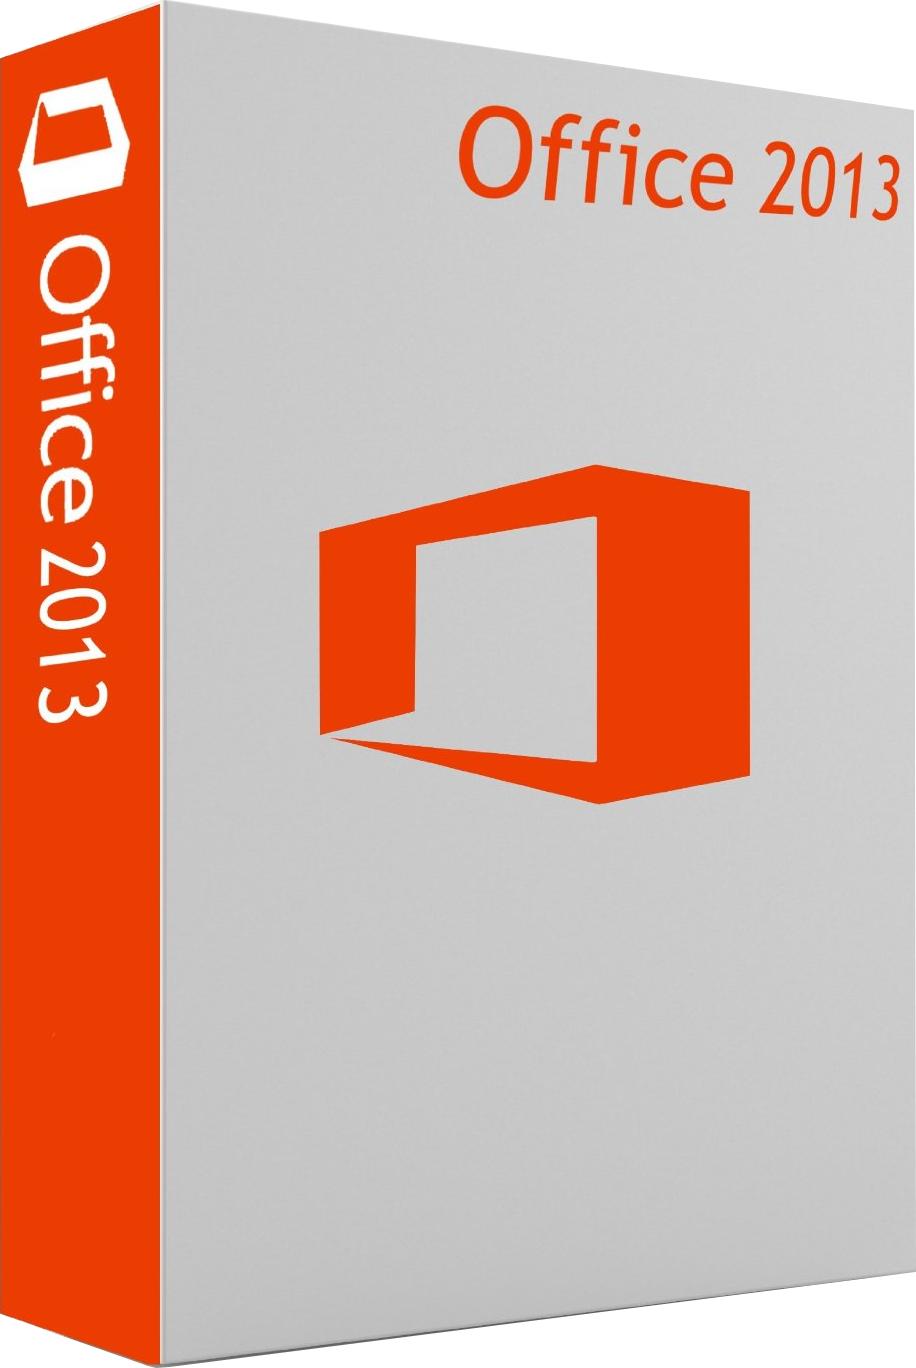 Ofiice 2013 | Gadgets | Pinterest